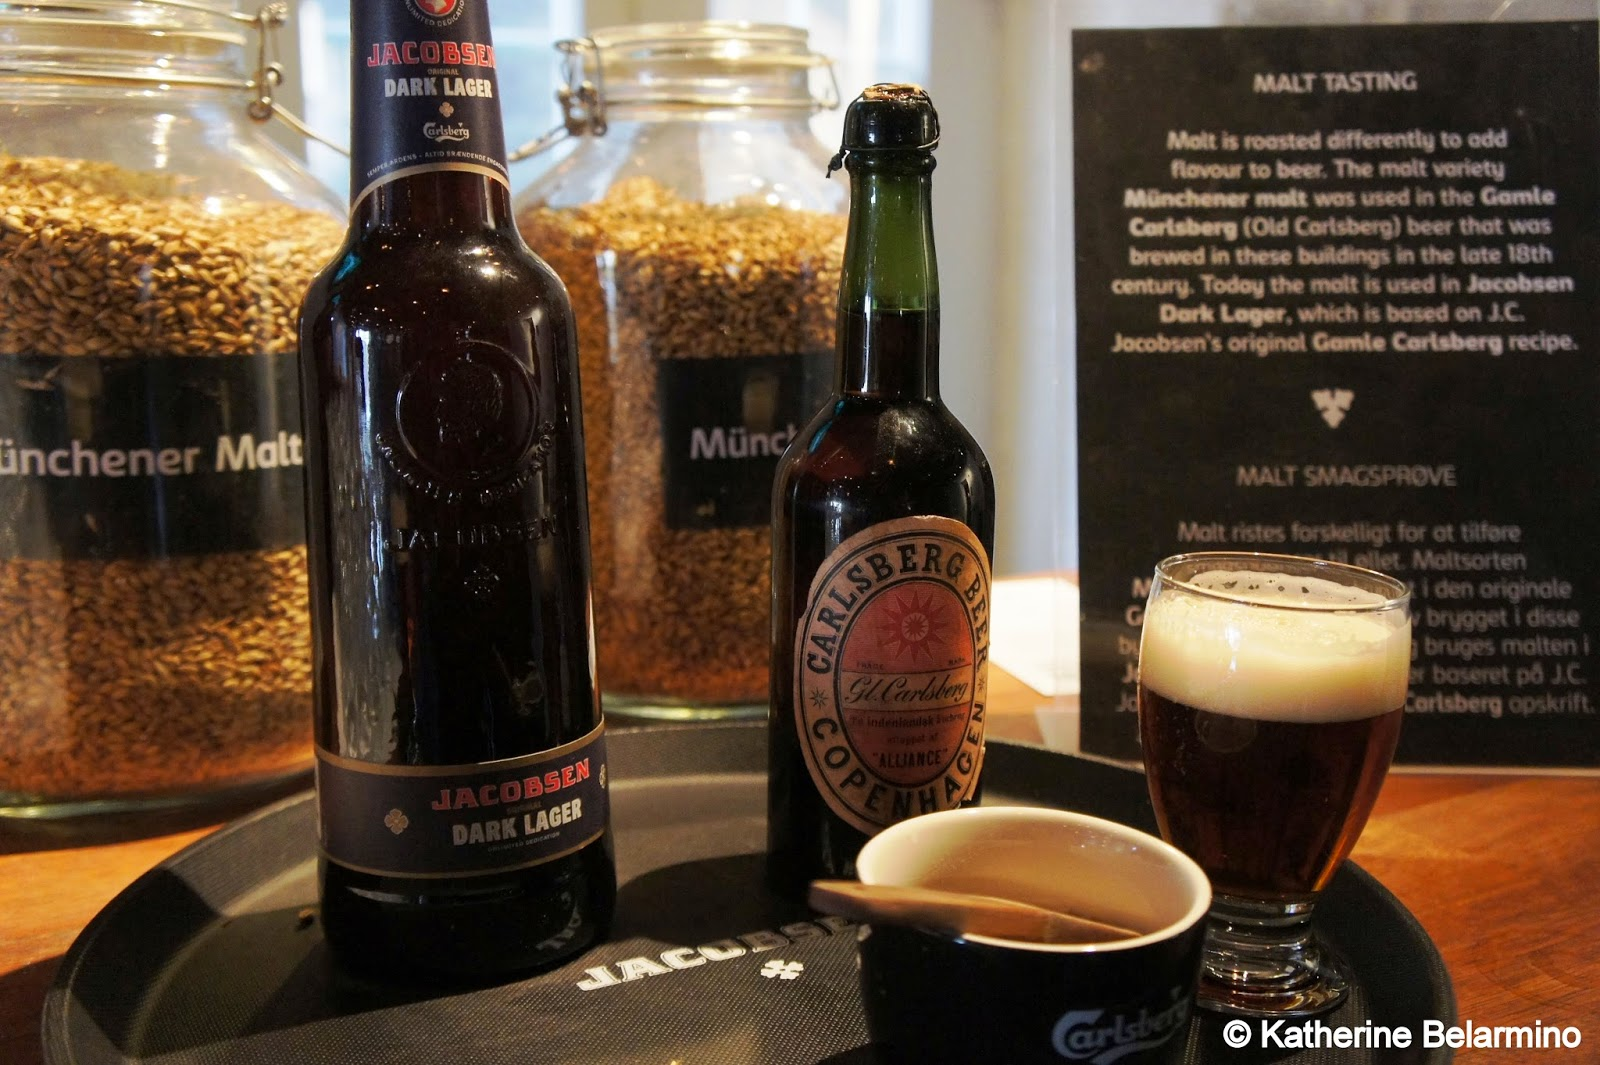 Carlsberg 1854 Recipe Beer Carlsberg Brewery Copenhagen Denmark